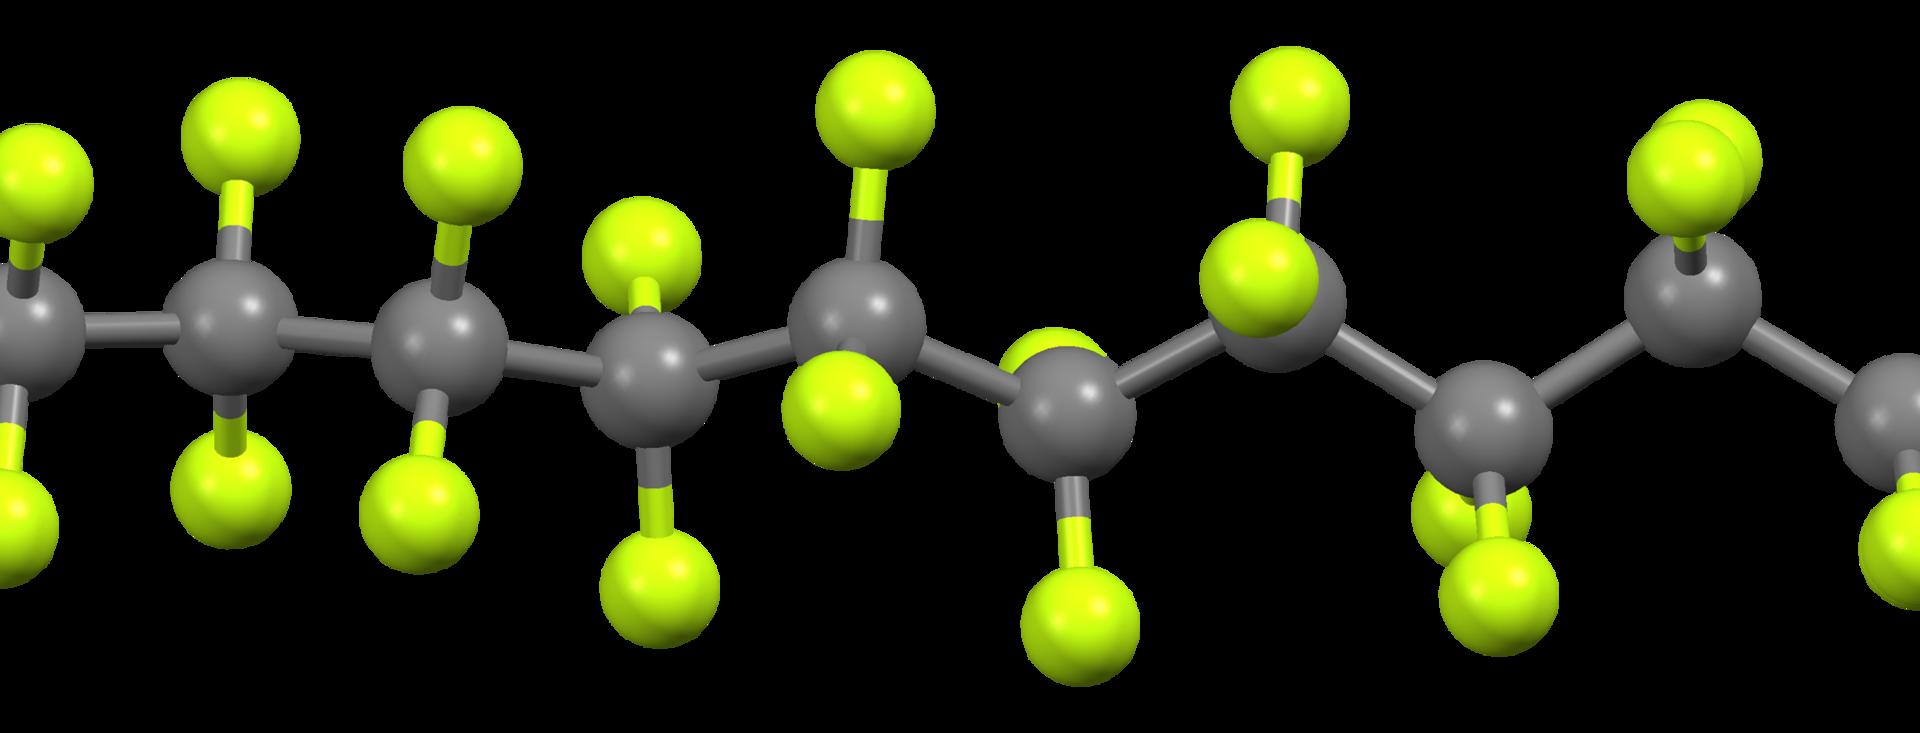 ptfe molecule